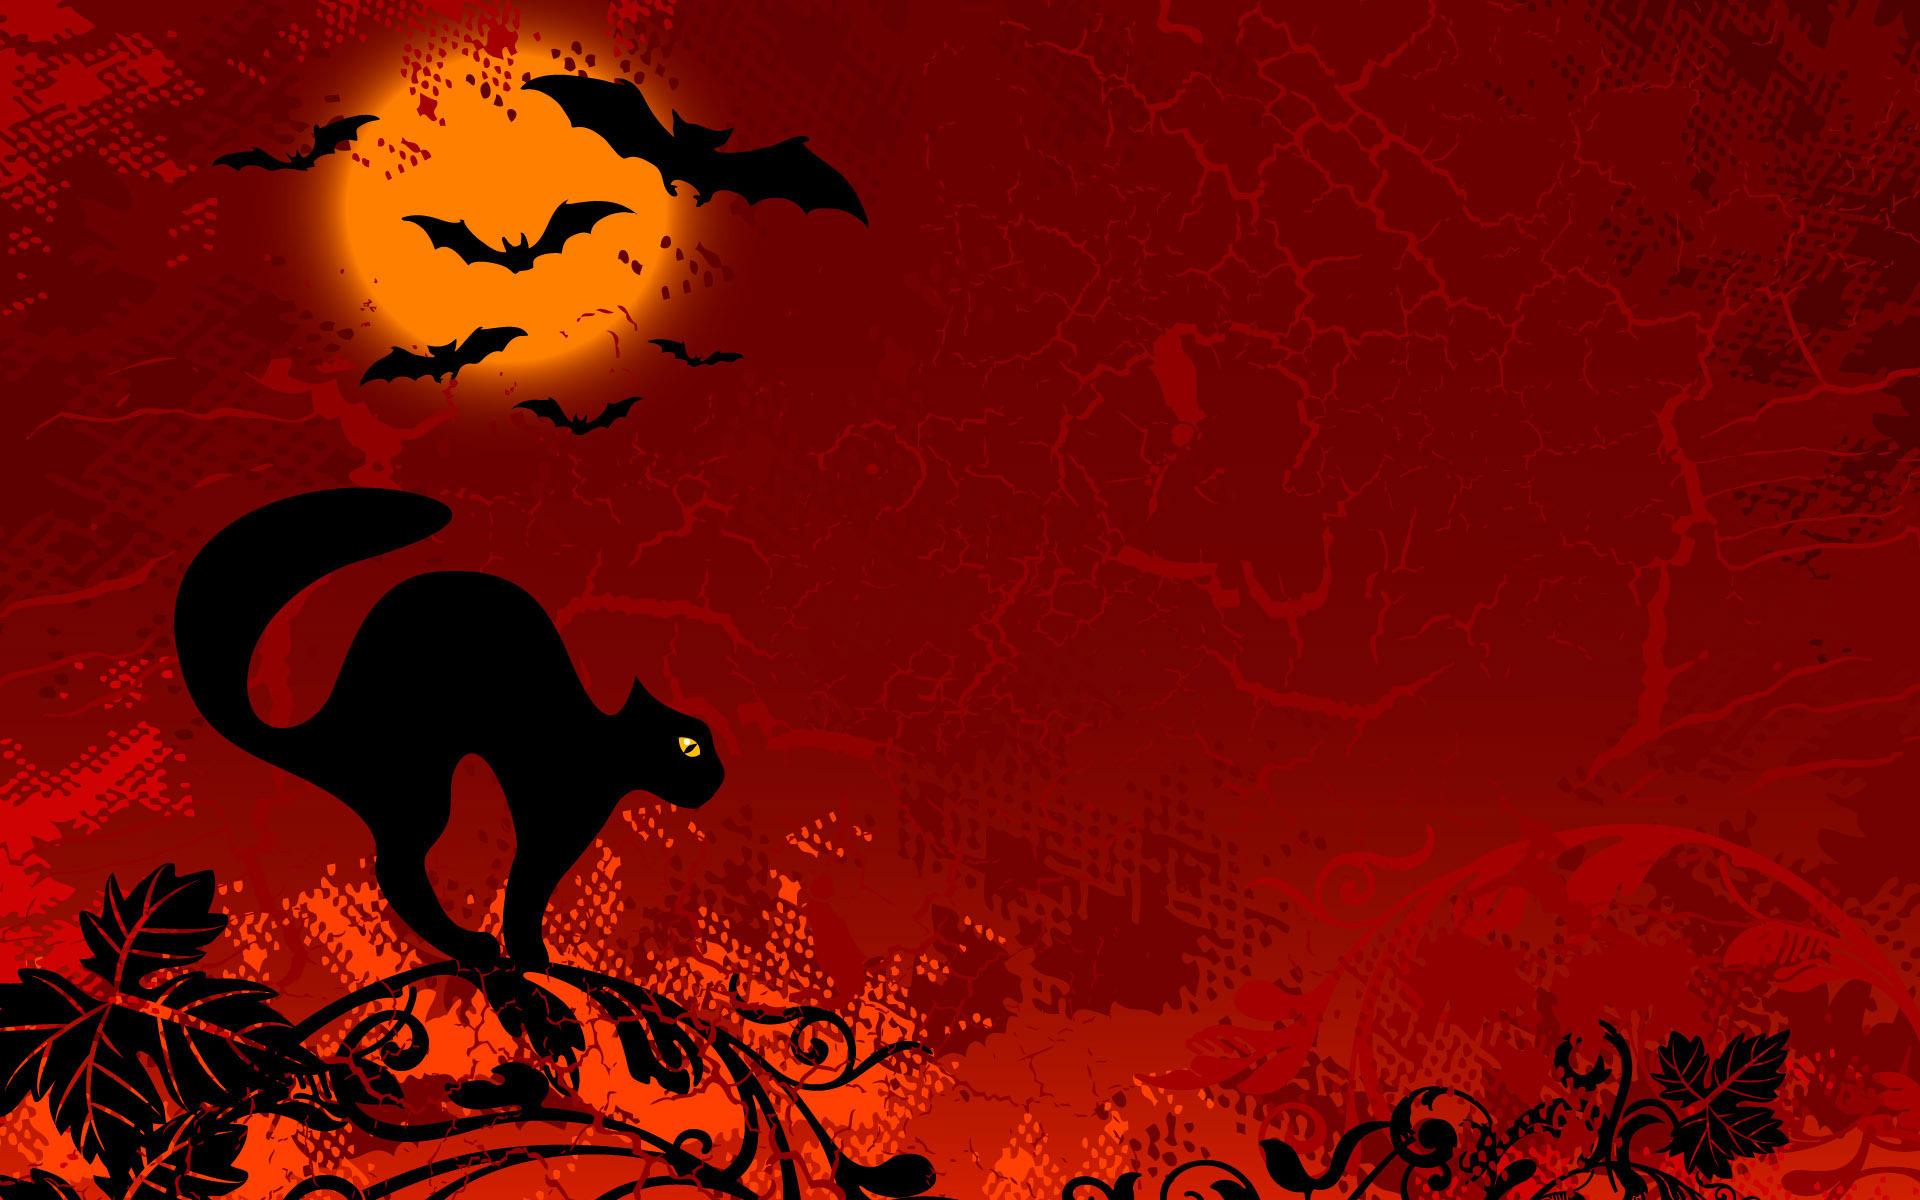 Halloween Aesthetic wallpapers,